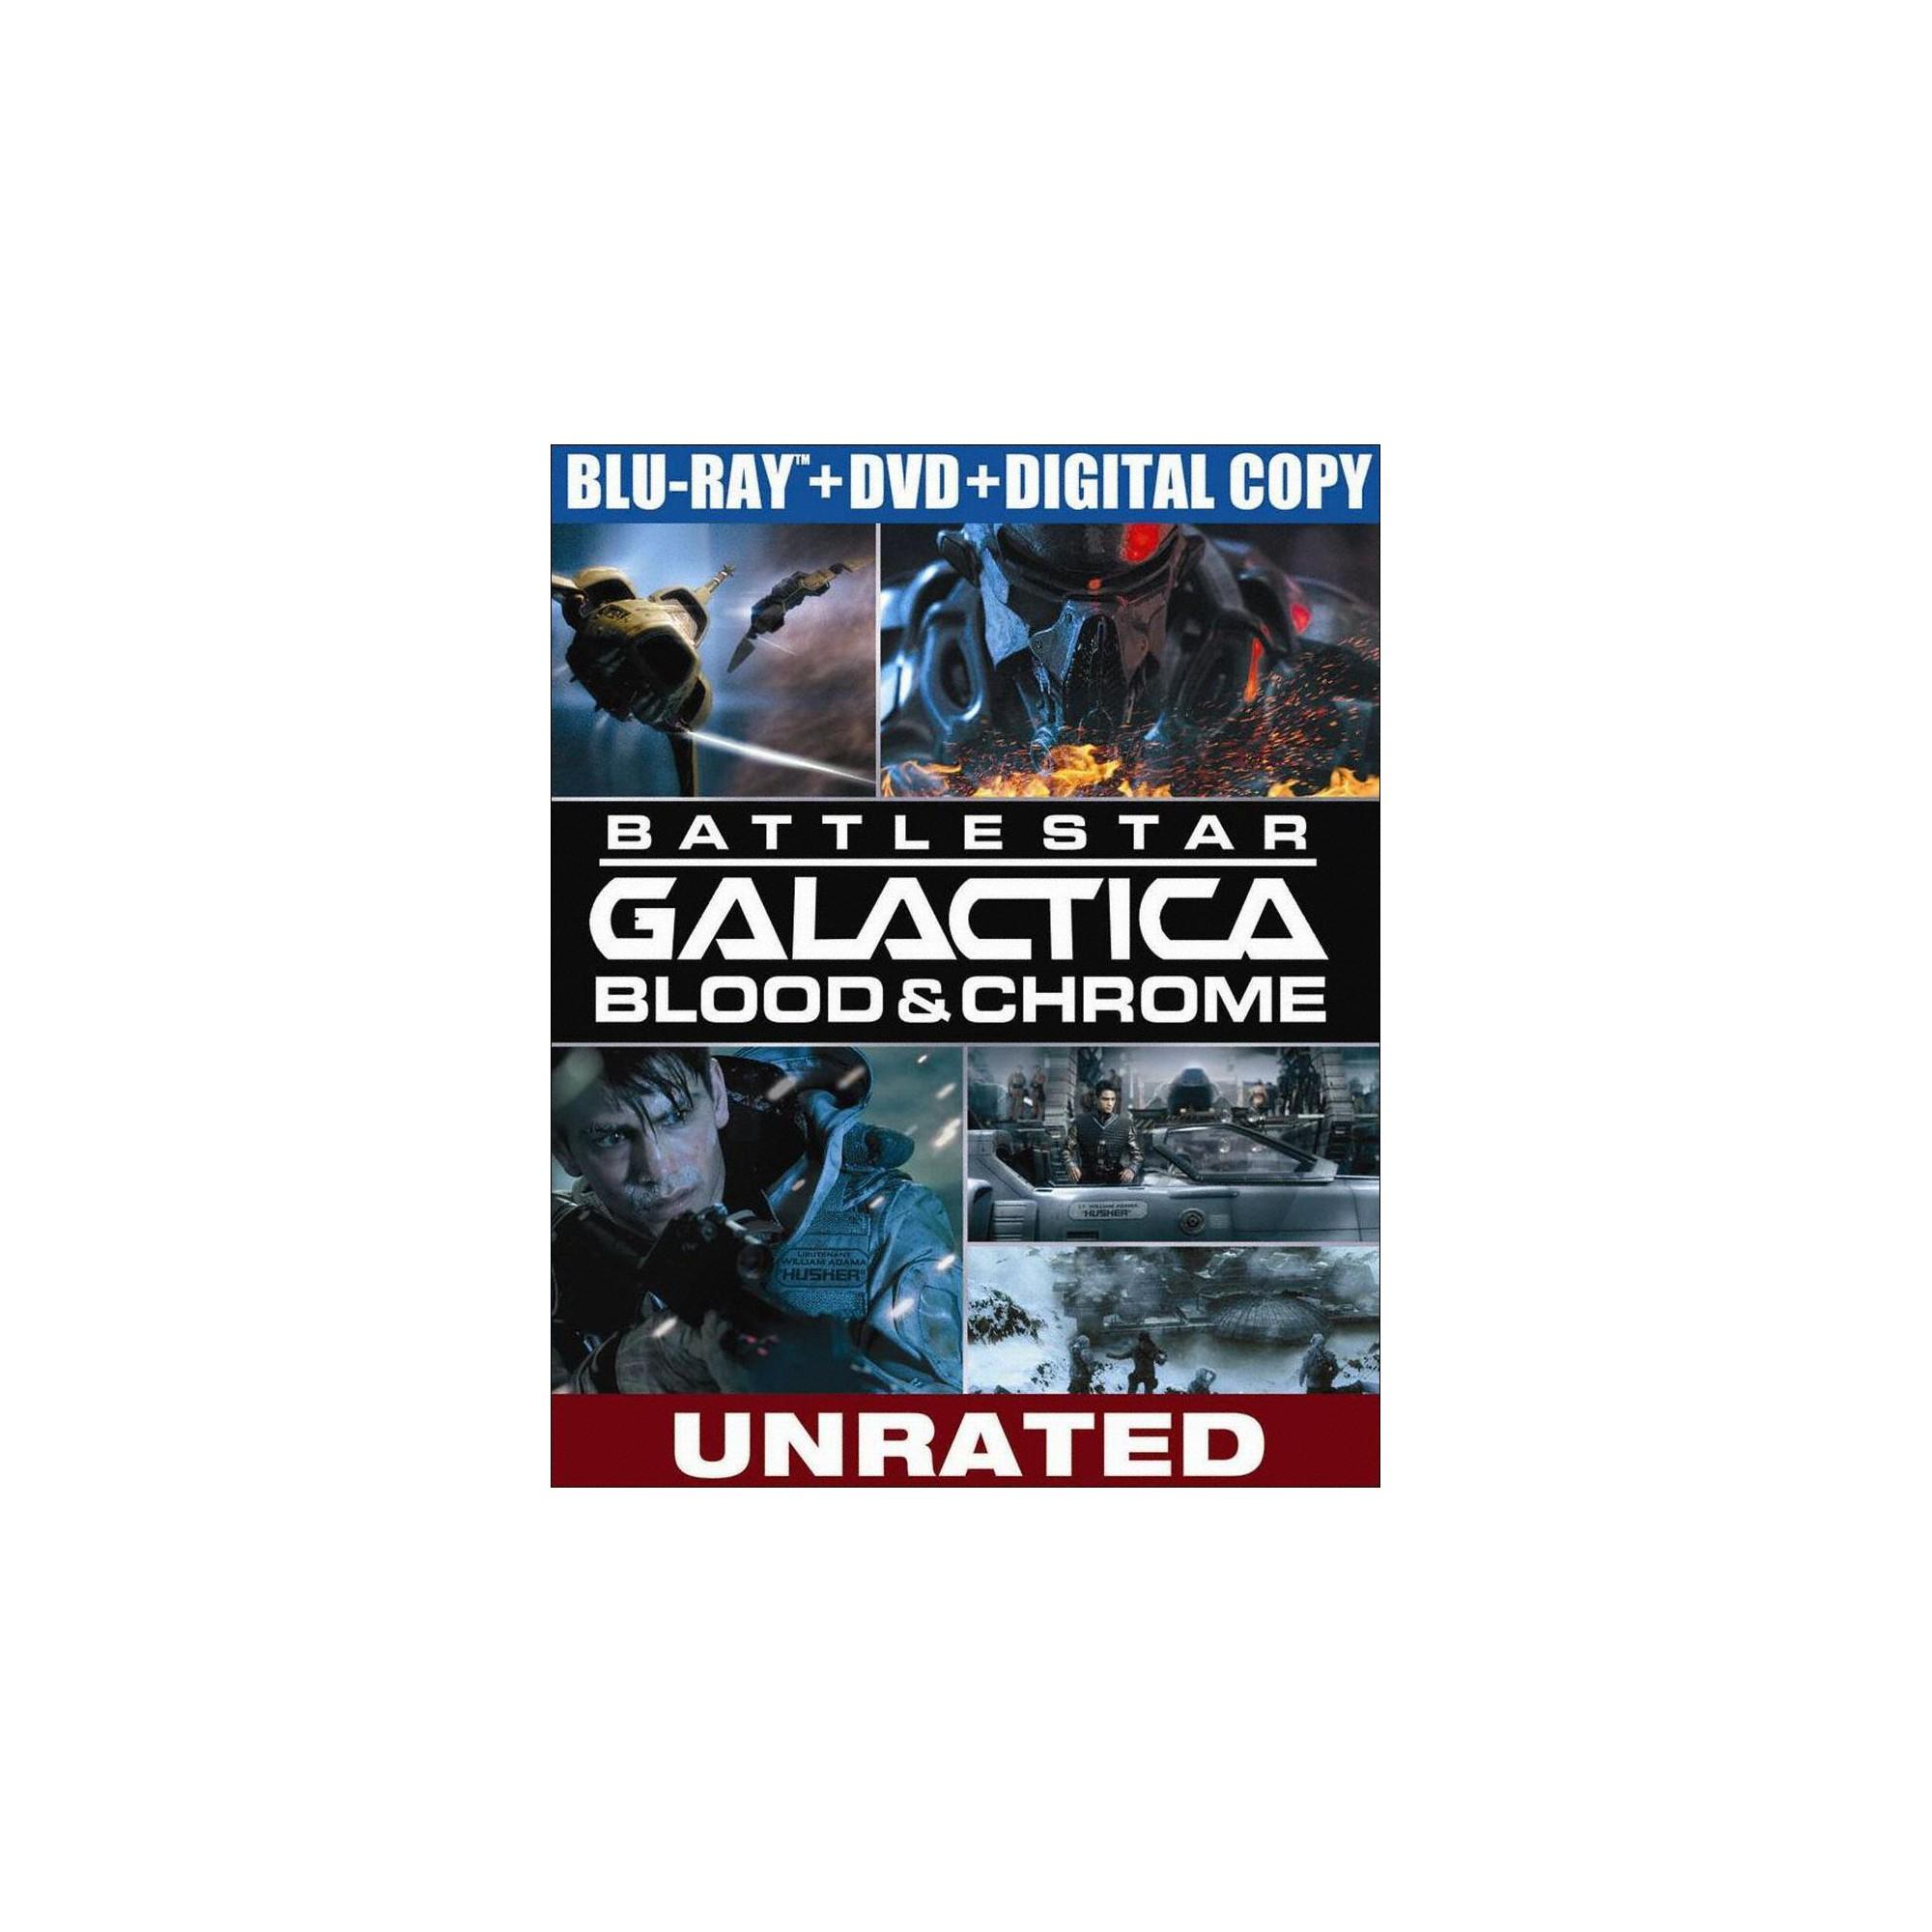 Battlestar Galactica Blood Chrome 2 Discs Blu Ray Dvd W